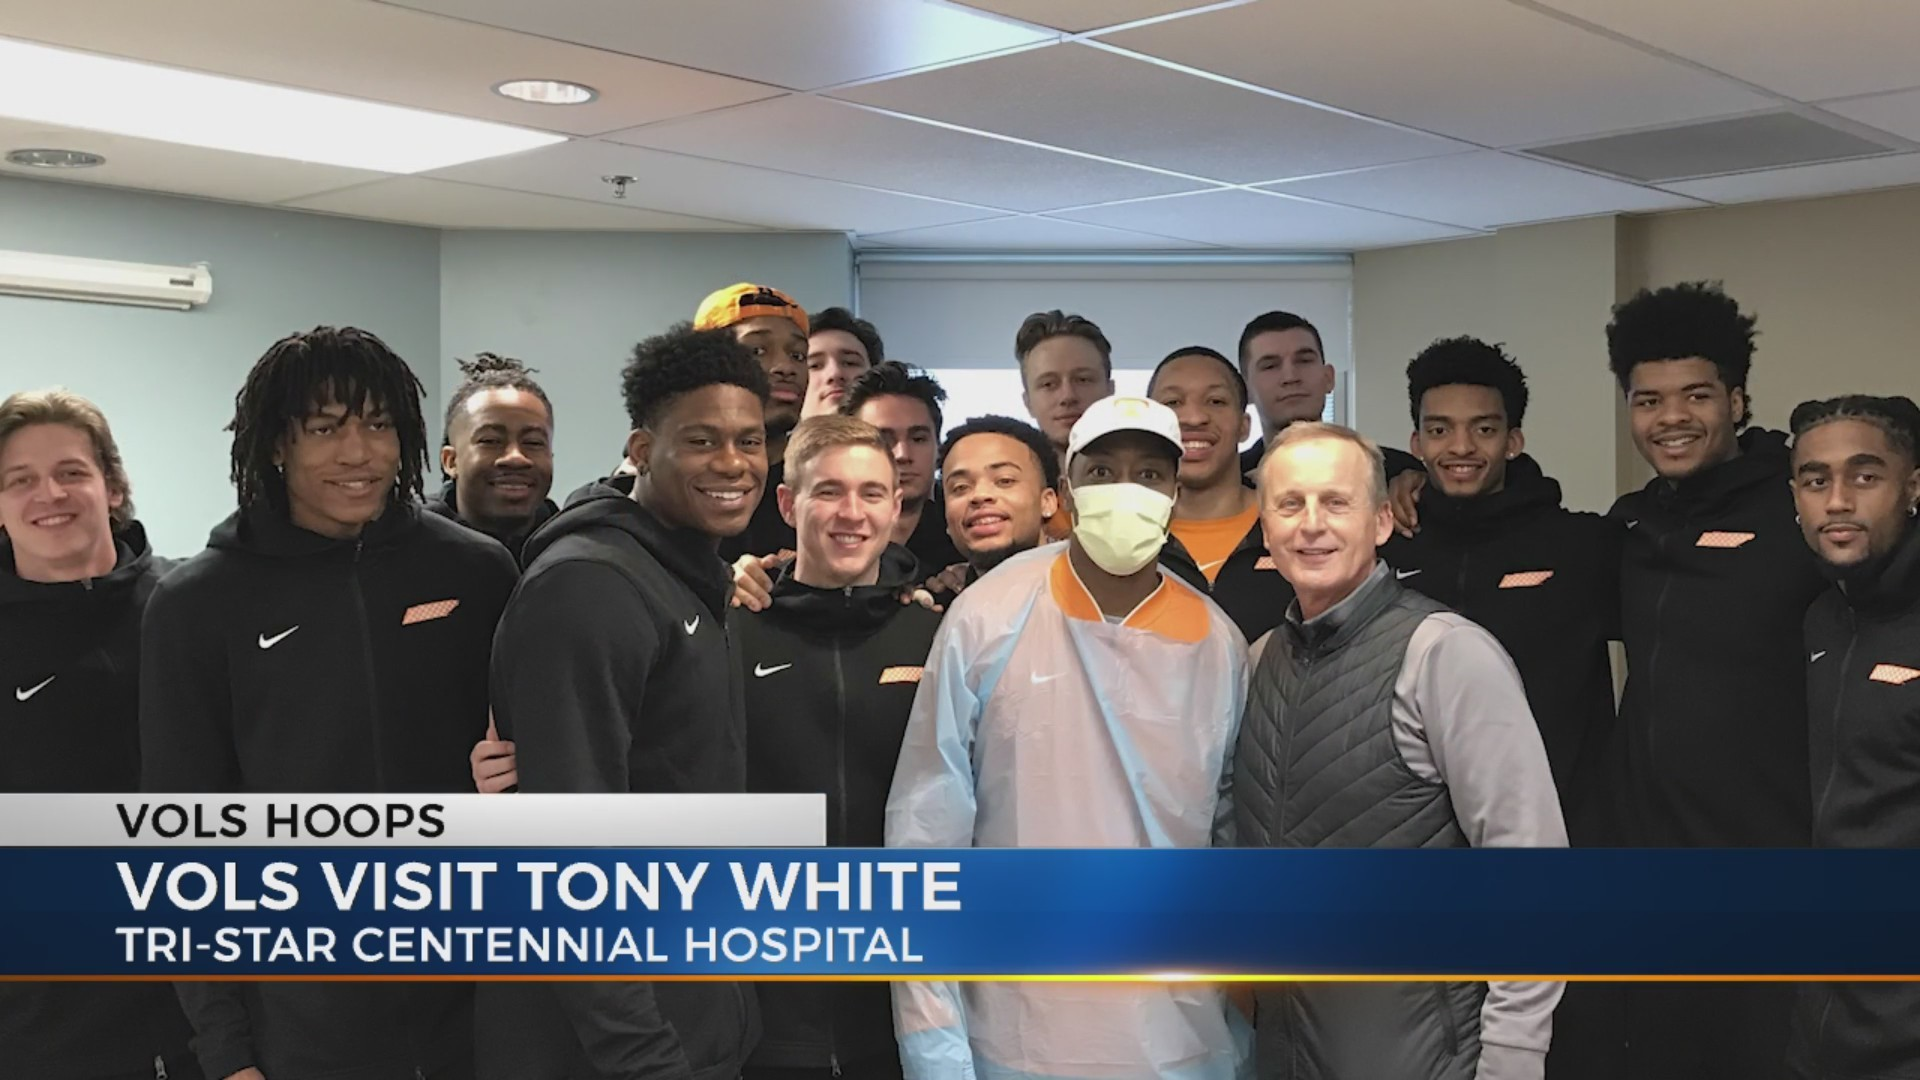 SEC_Tourney_Vols_visit_hospital_0_20190314225837